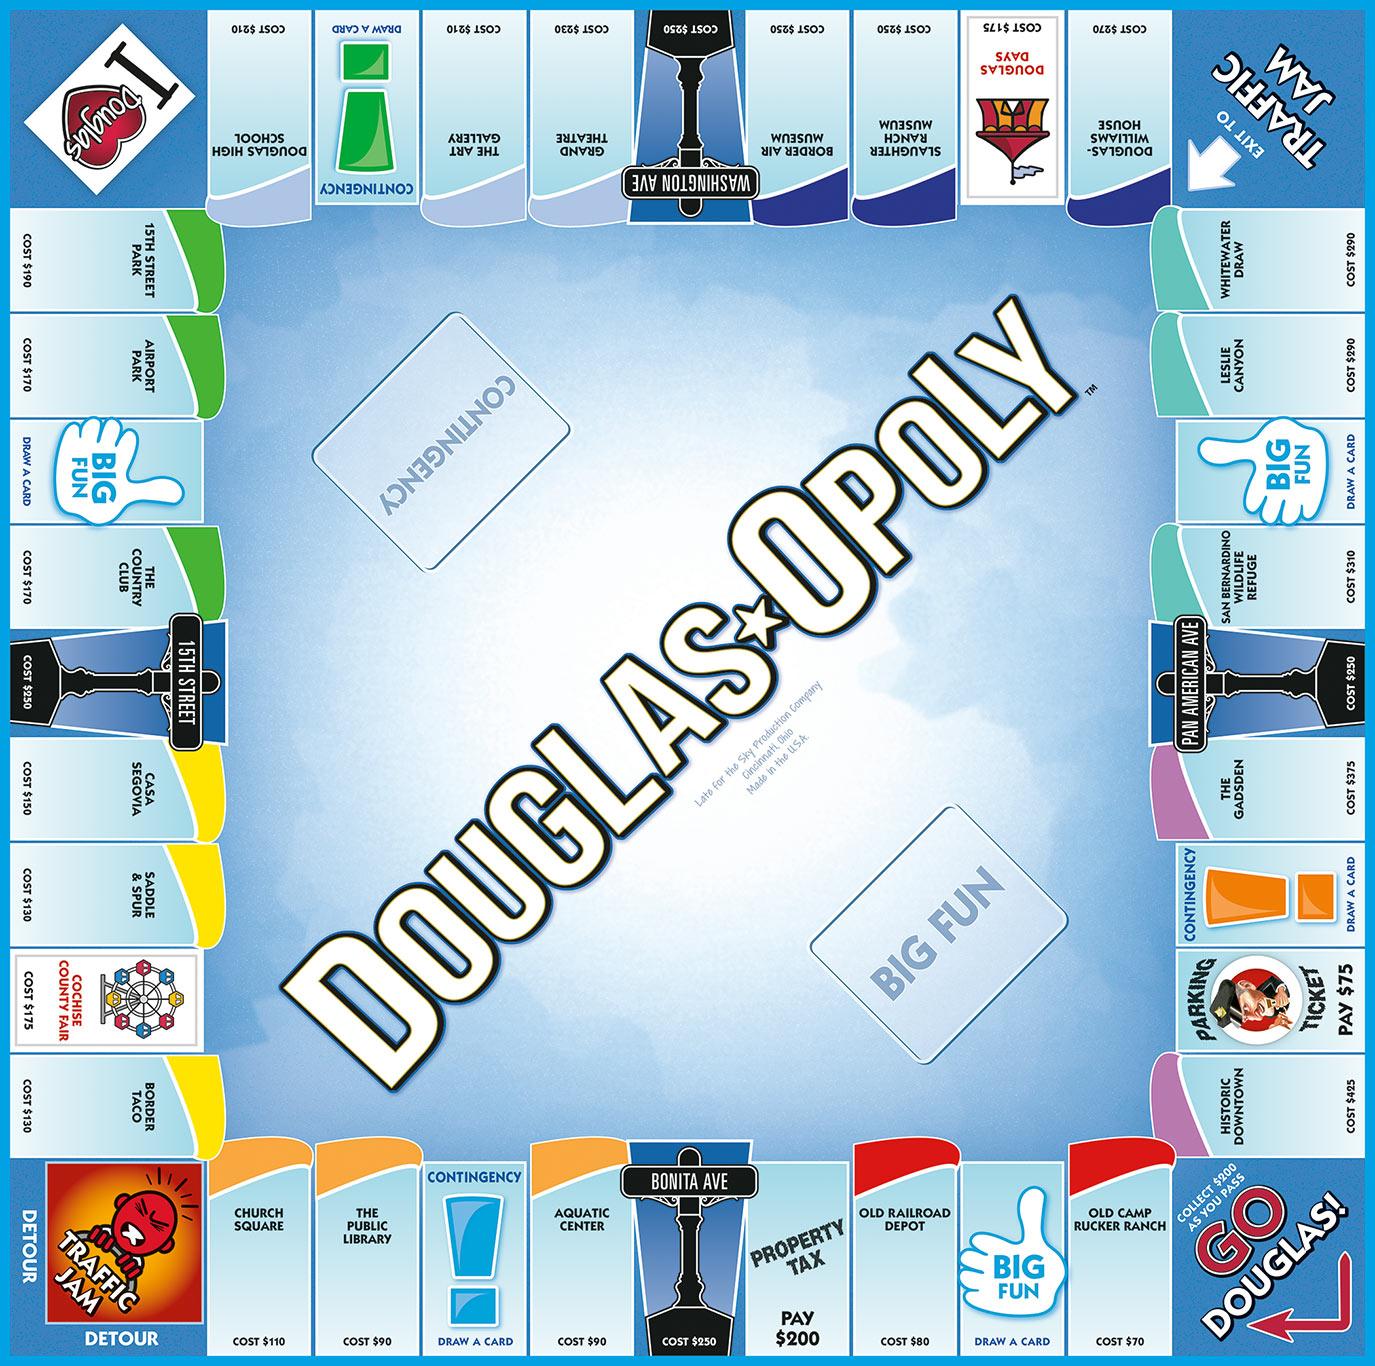 DOUGLAS-OPOLY Board Game